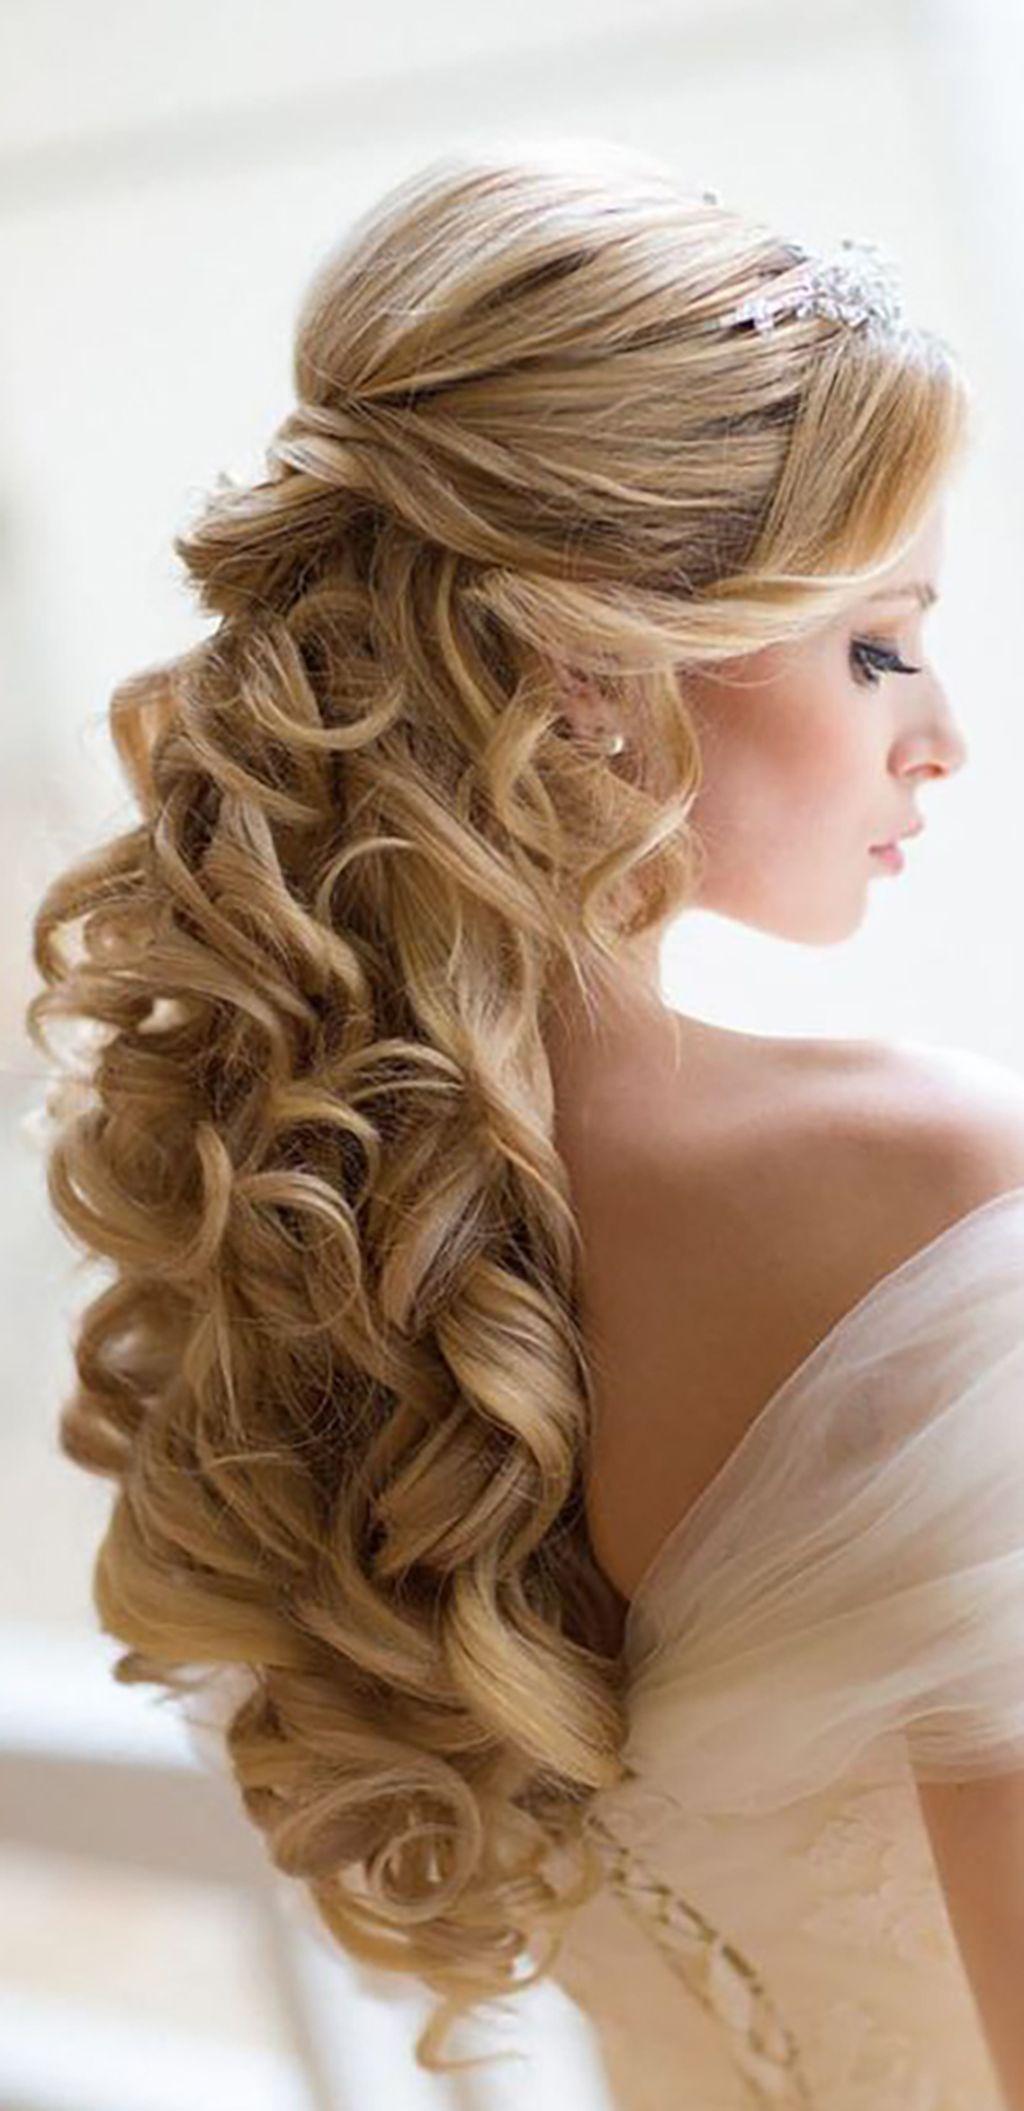 86 Classy Wedding Hairstyle Ideas for Long Hair Women